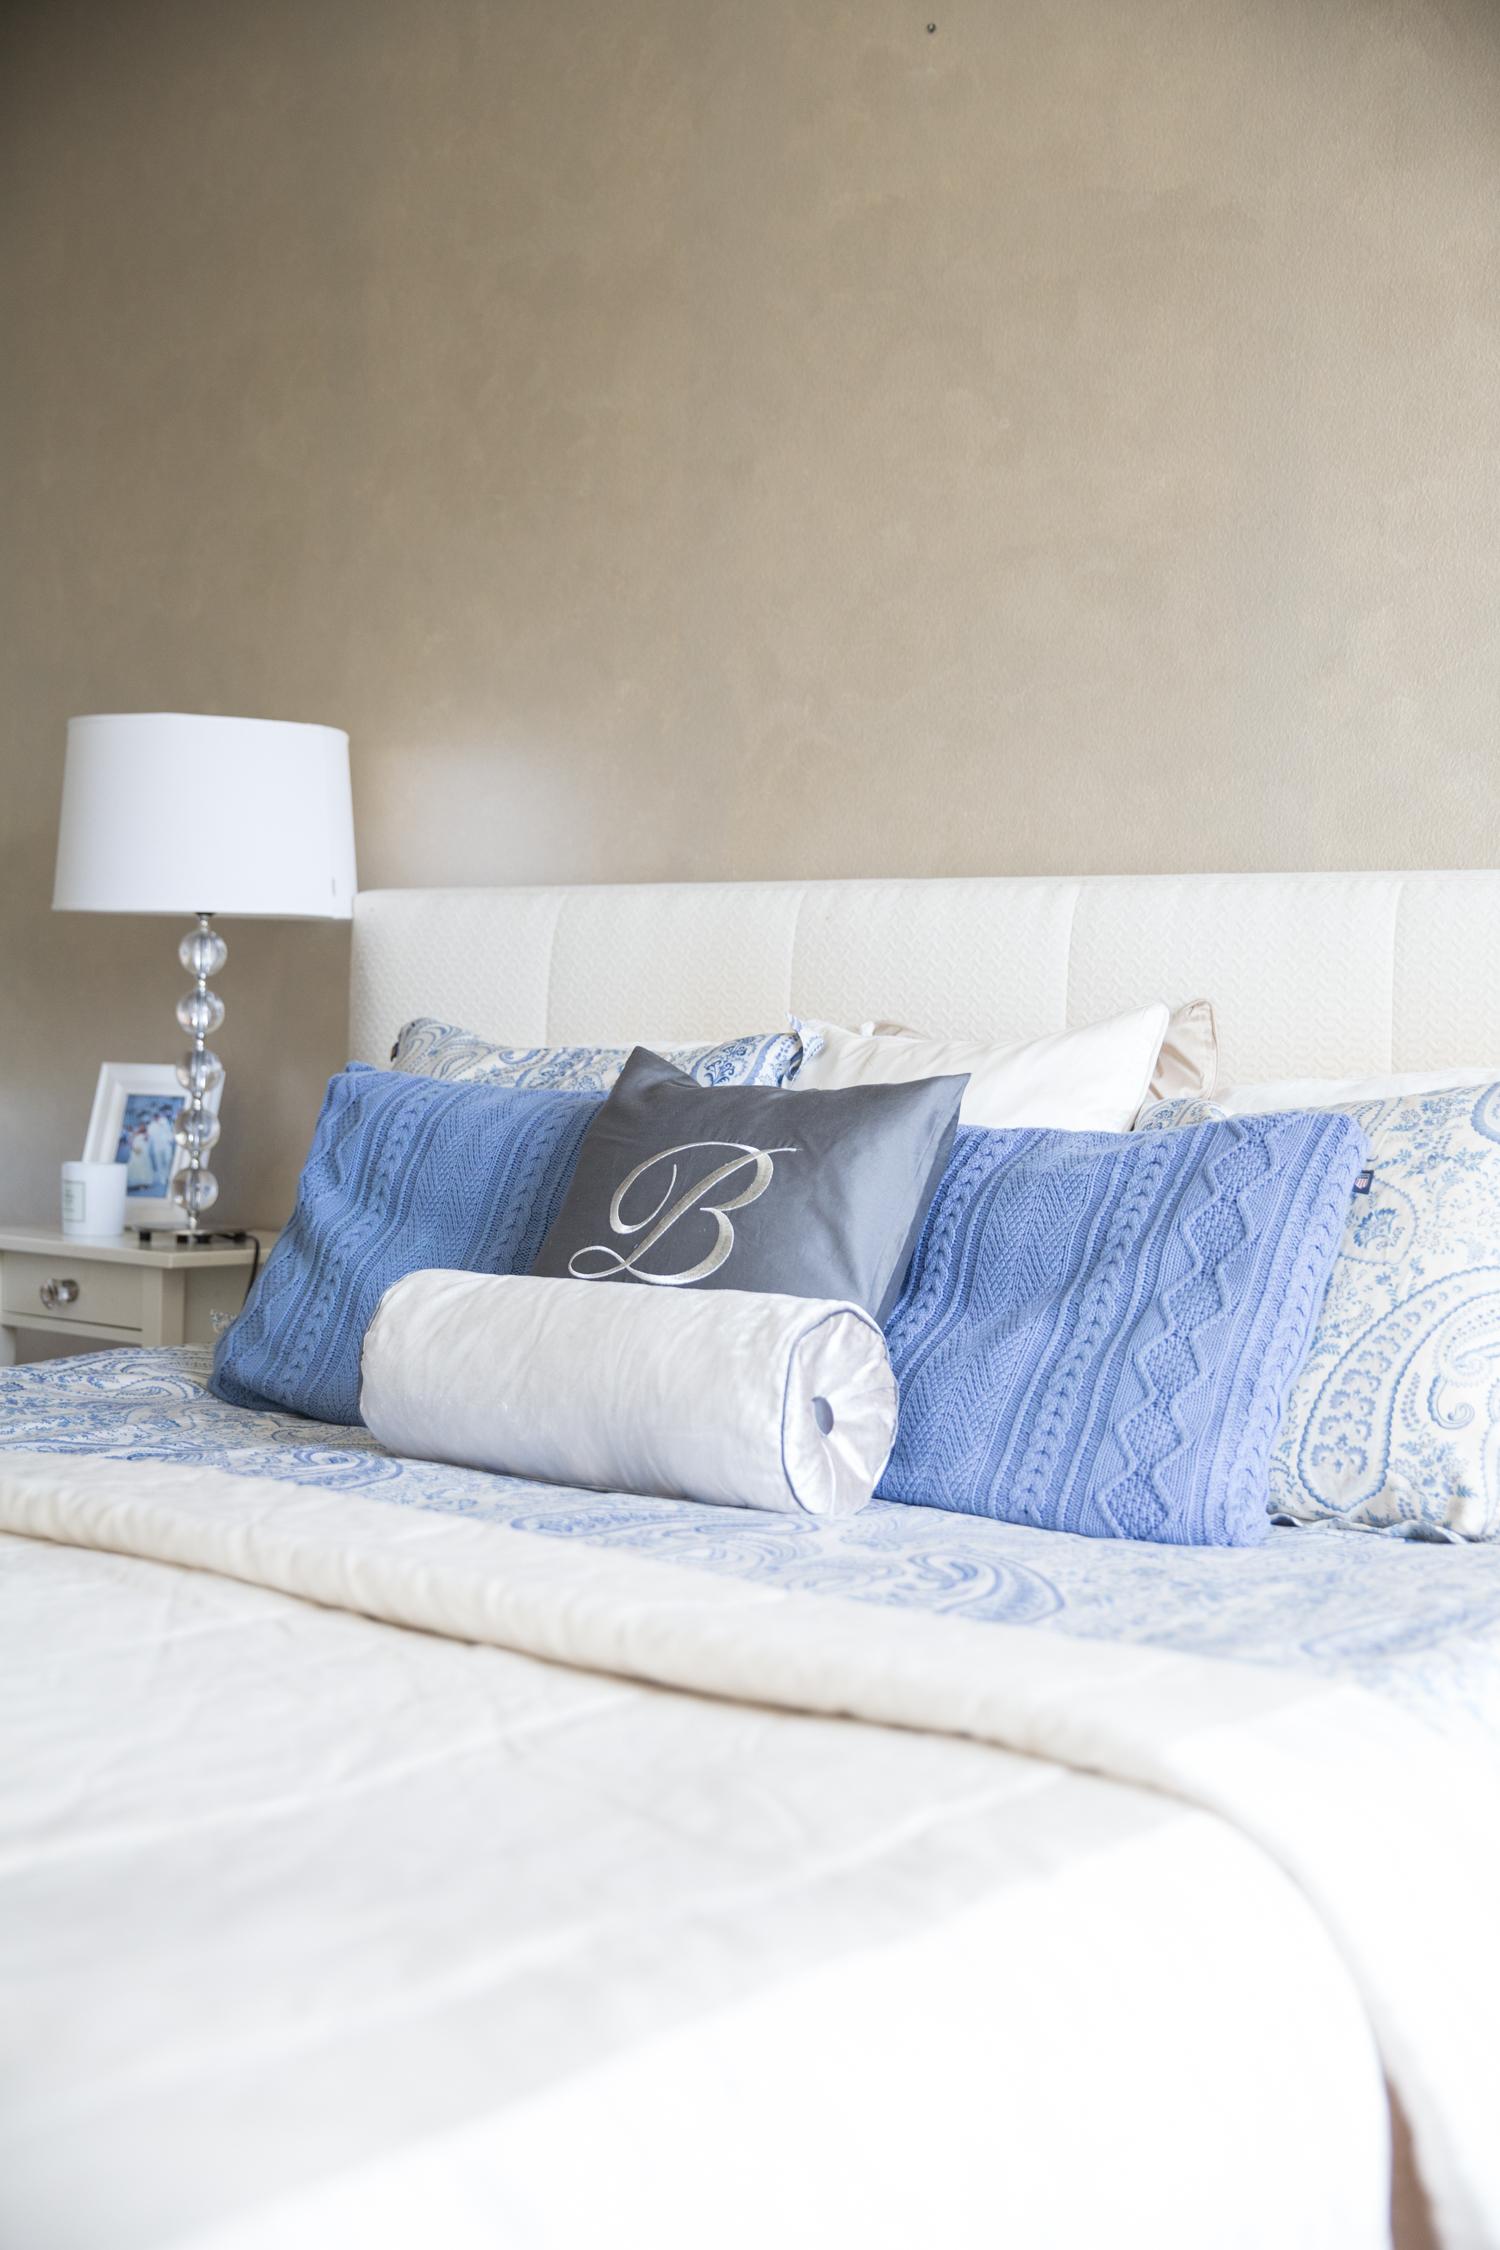 bedroom stadi-6724